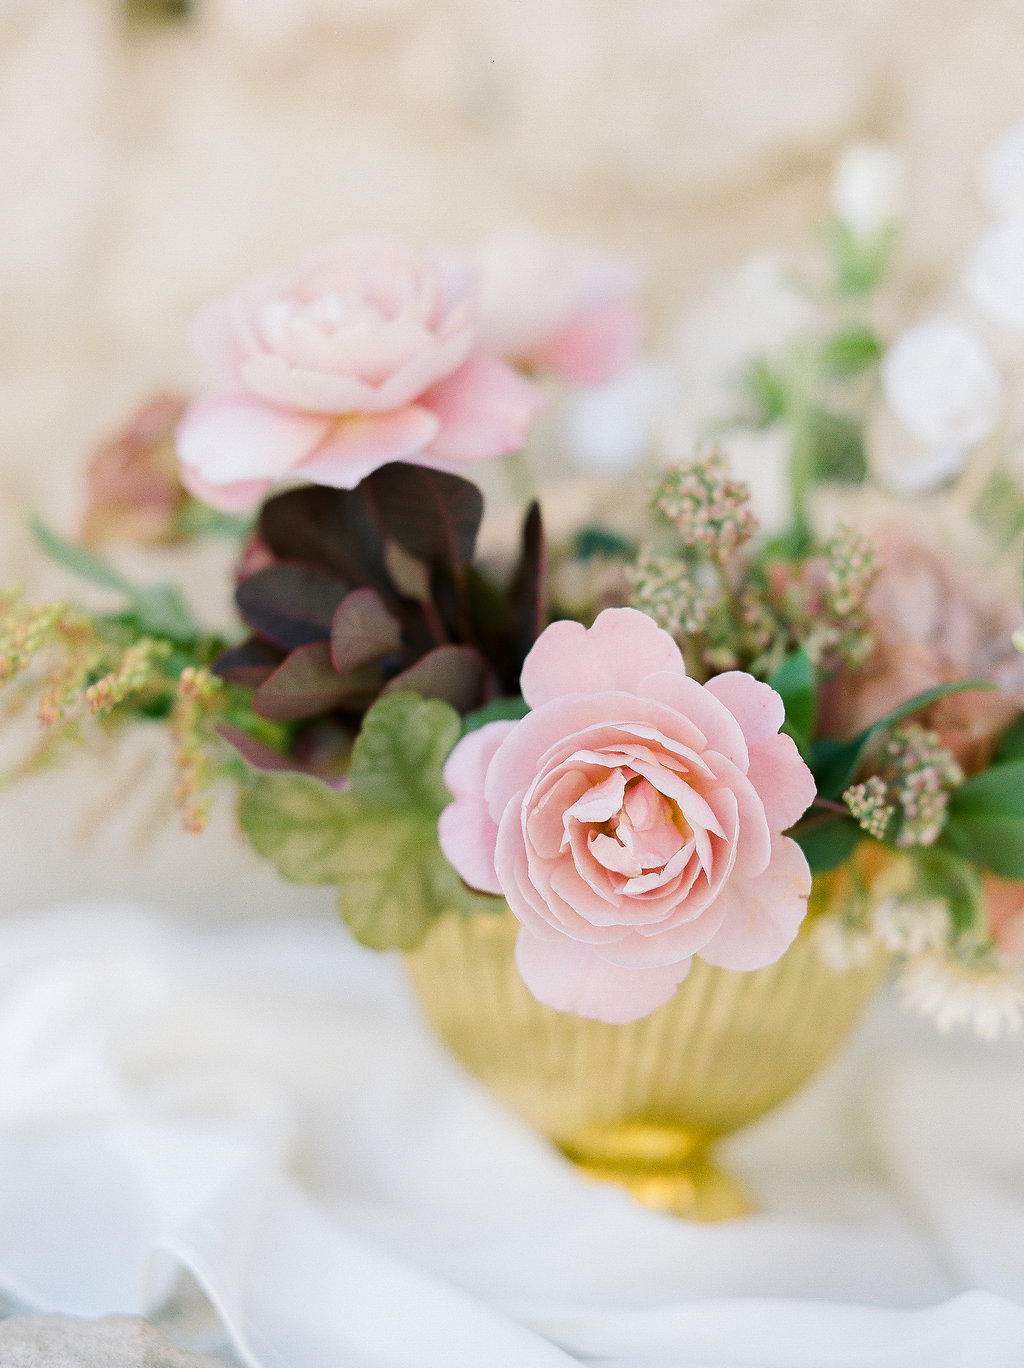 Spanish Mission Style Wedding Ideas Summer Roses Flowers Finding Flora San Juan Capistrano European Venues California Centerpiece Reception